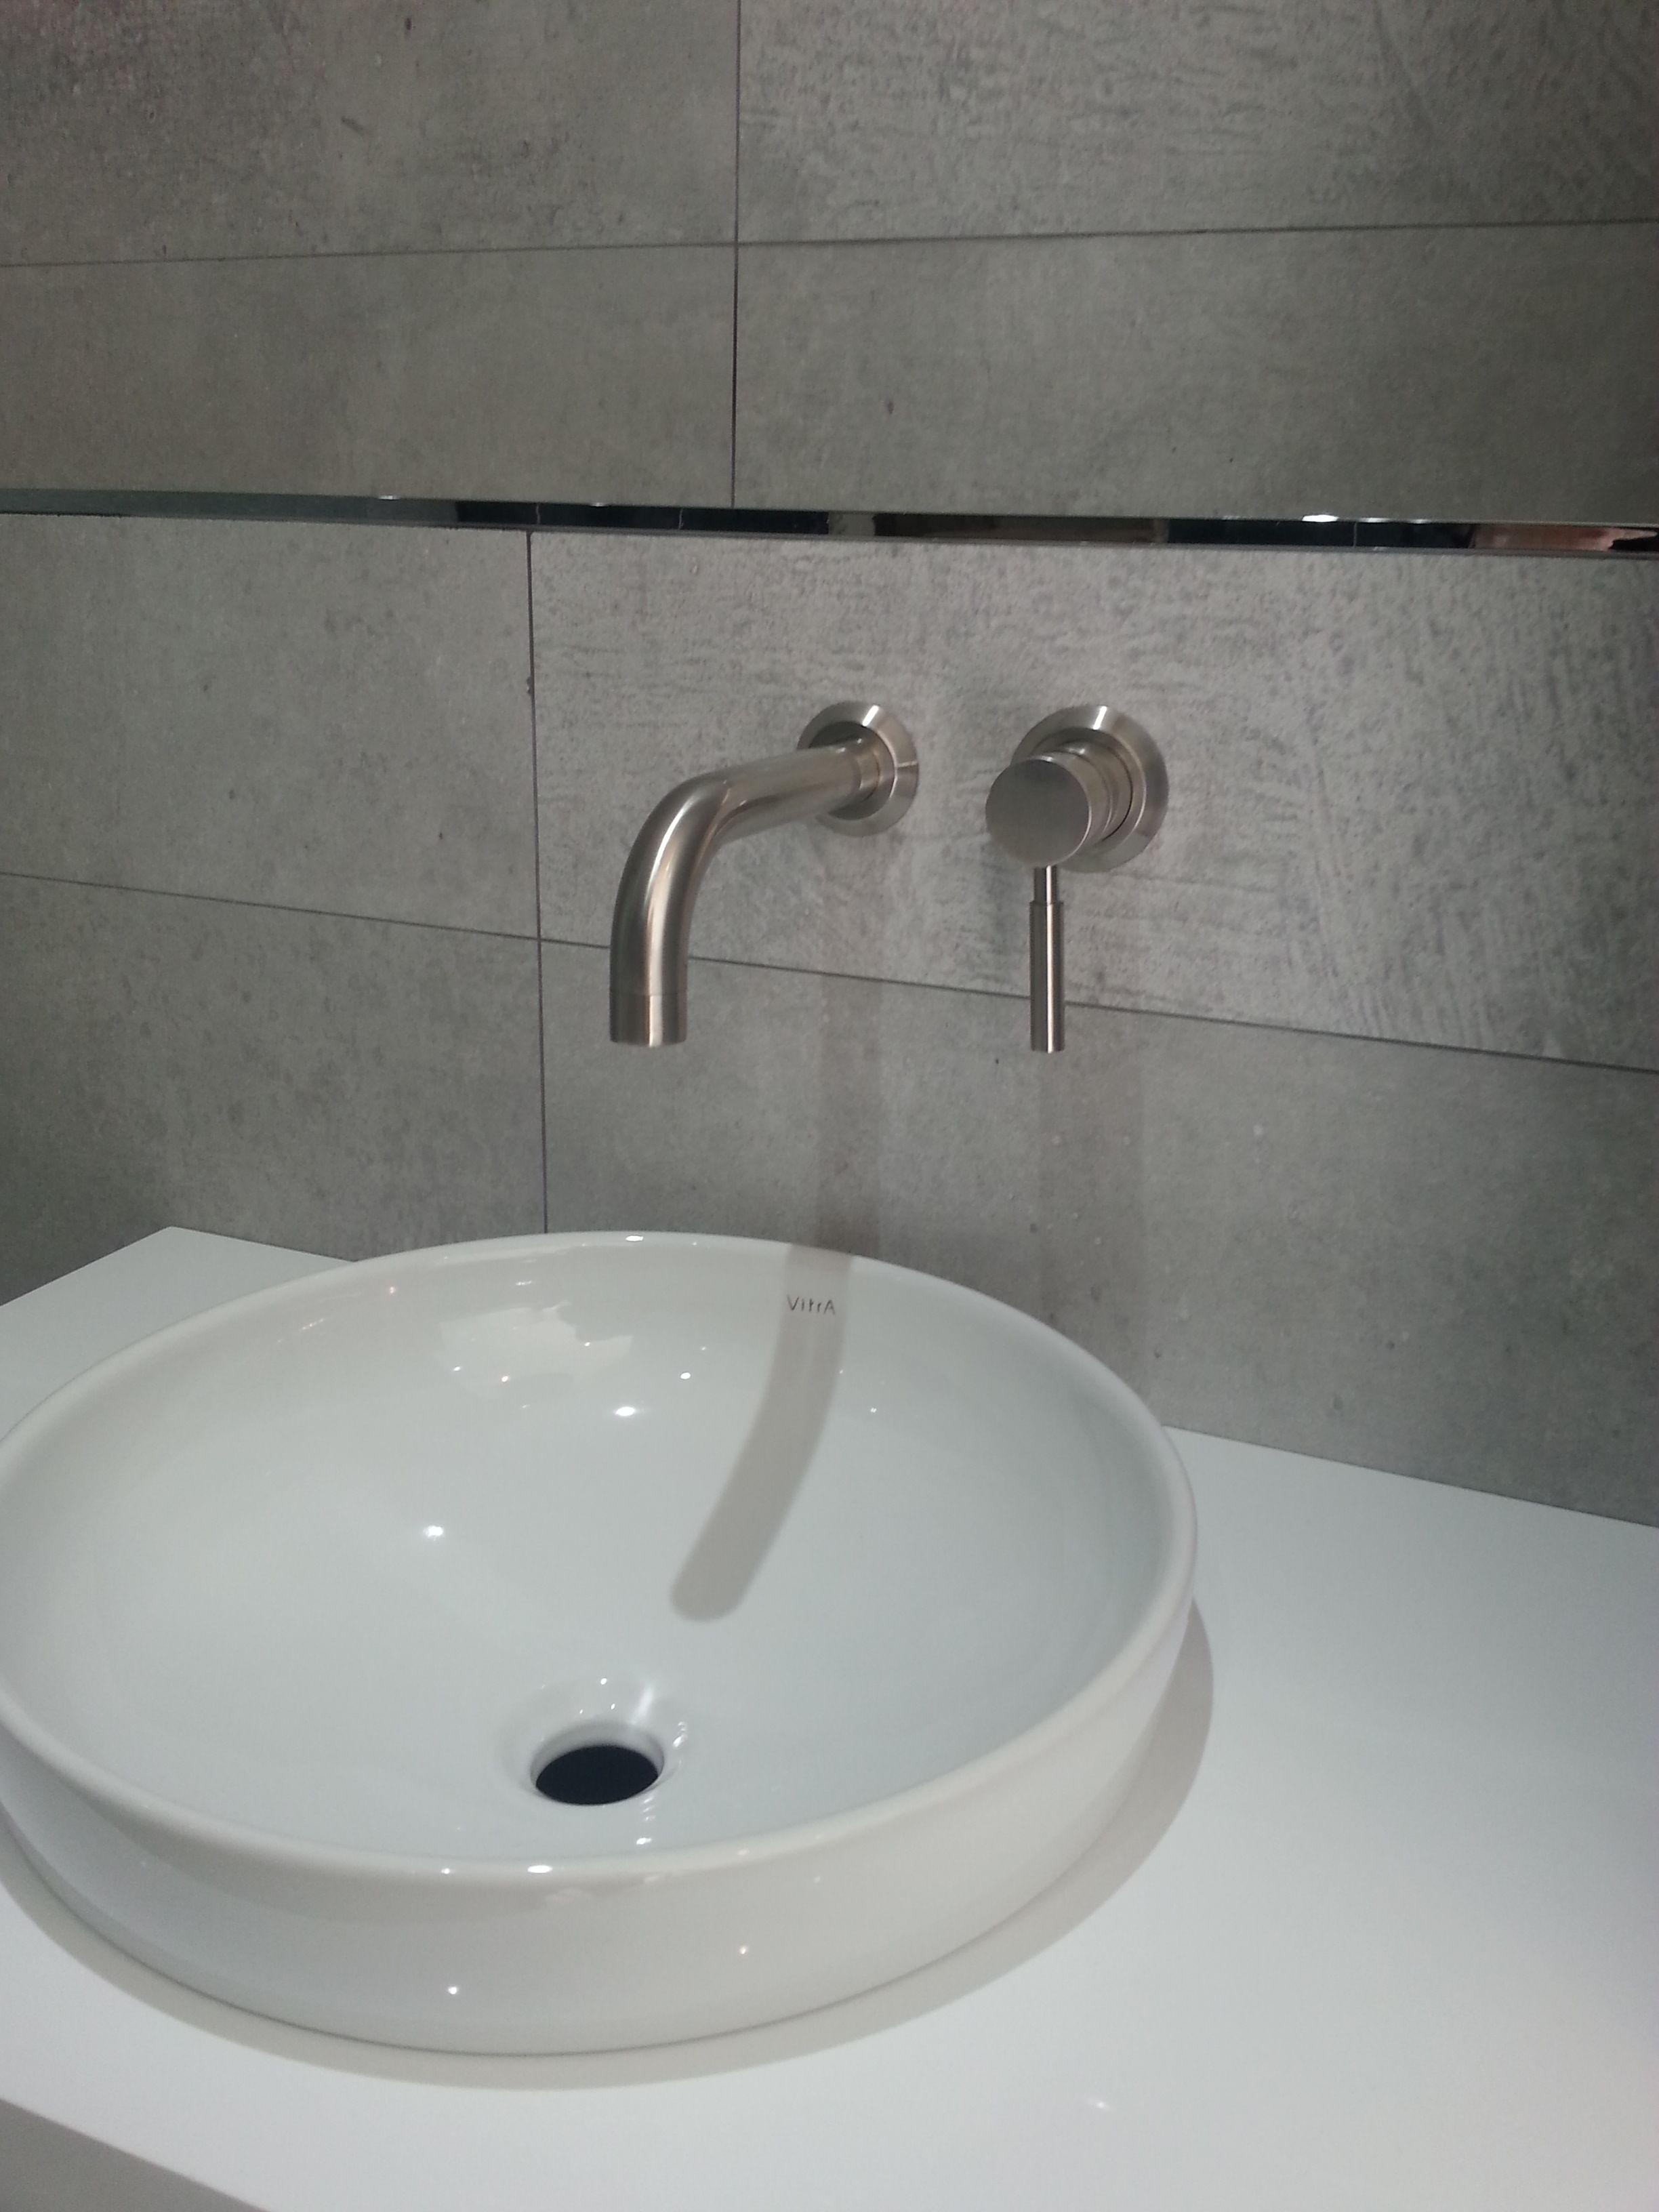 hansa bath symetrics pin fitting spa dornbracht faucets